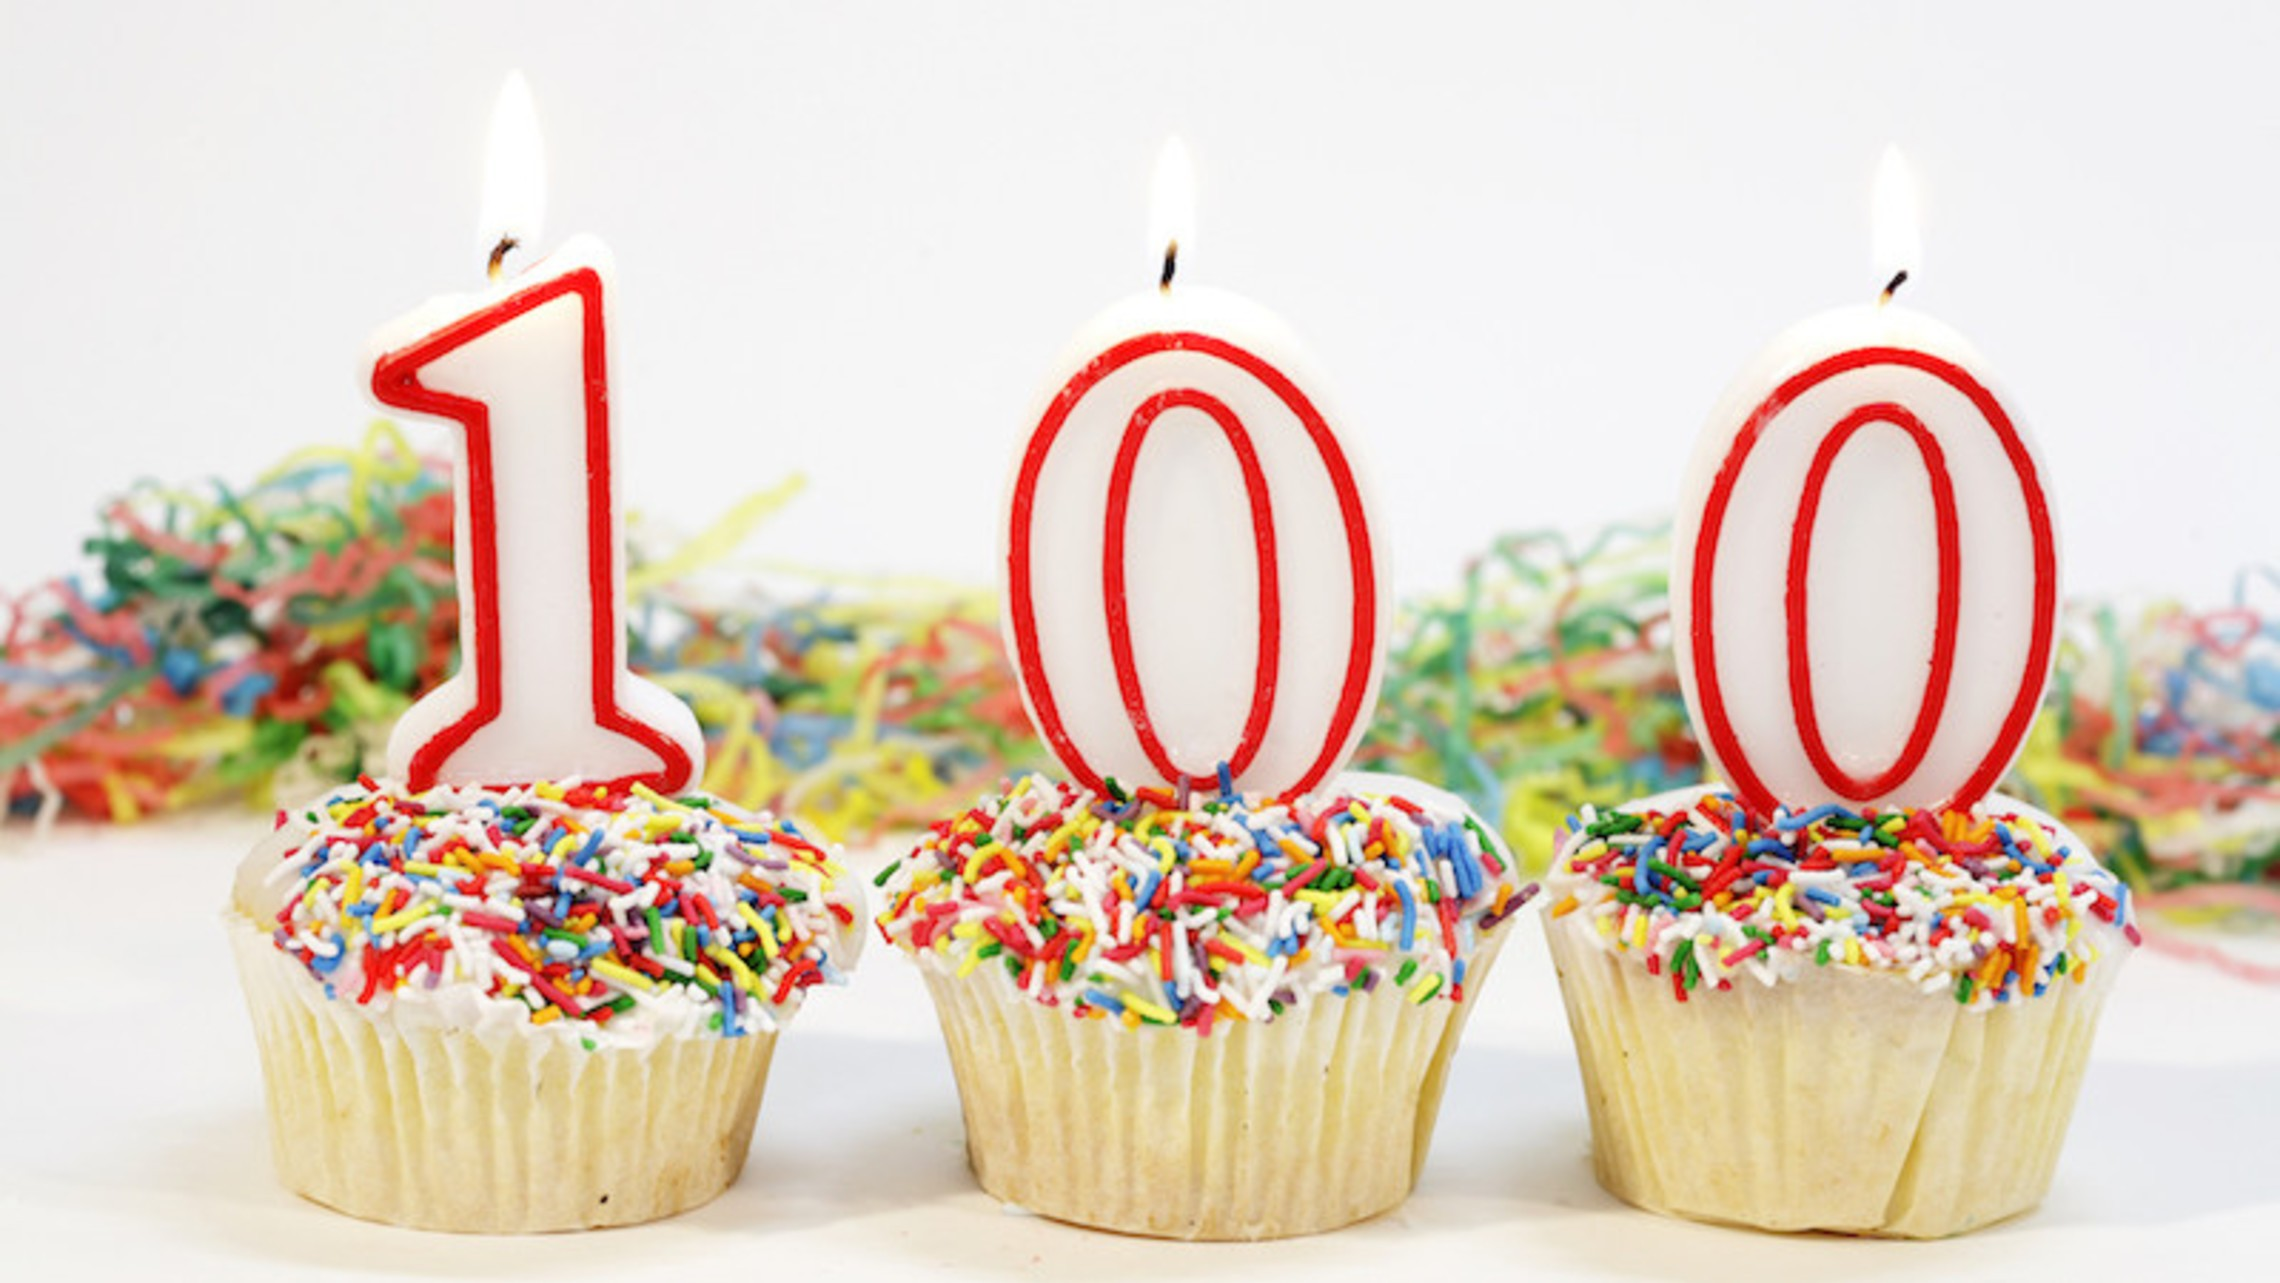 100th Celebration